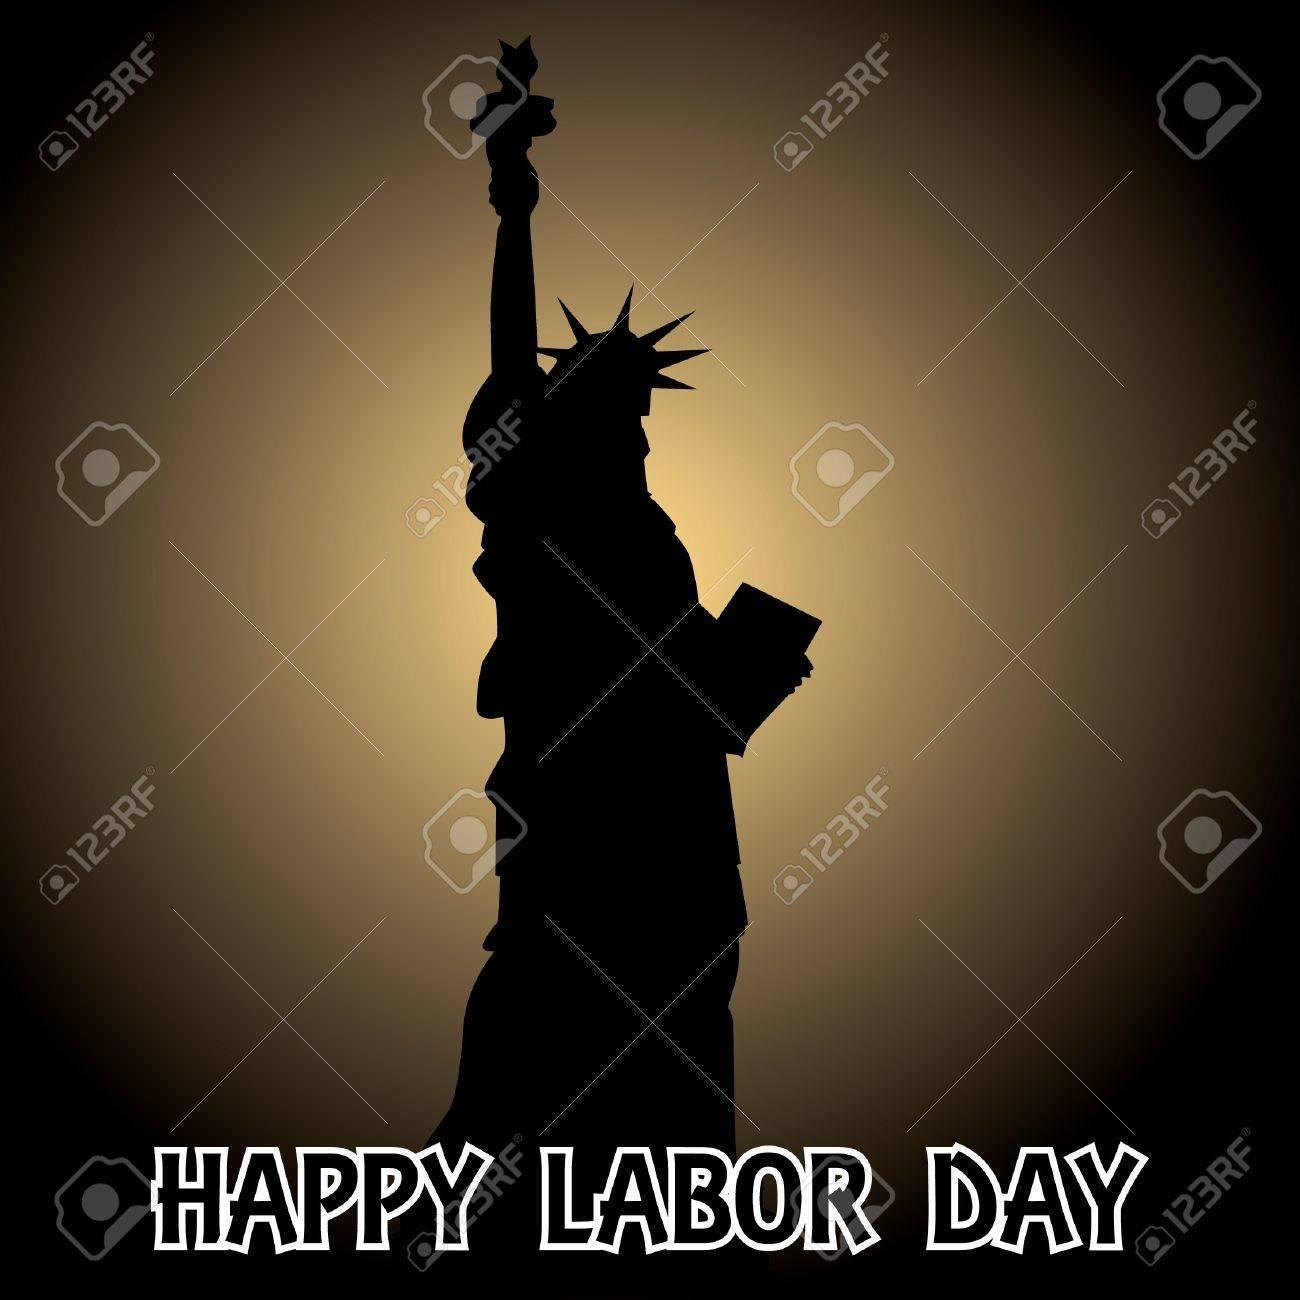 happy labor day - illustration Stock Vector - 12453317